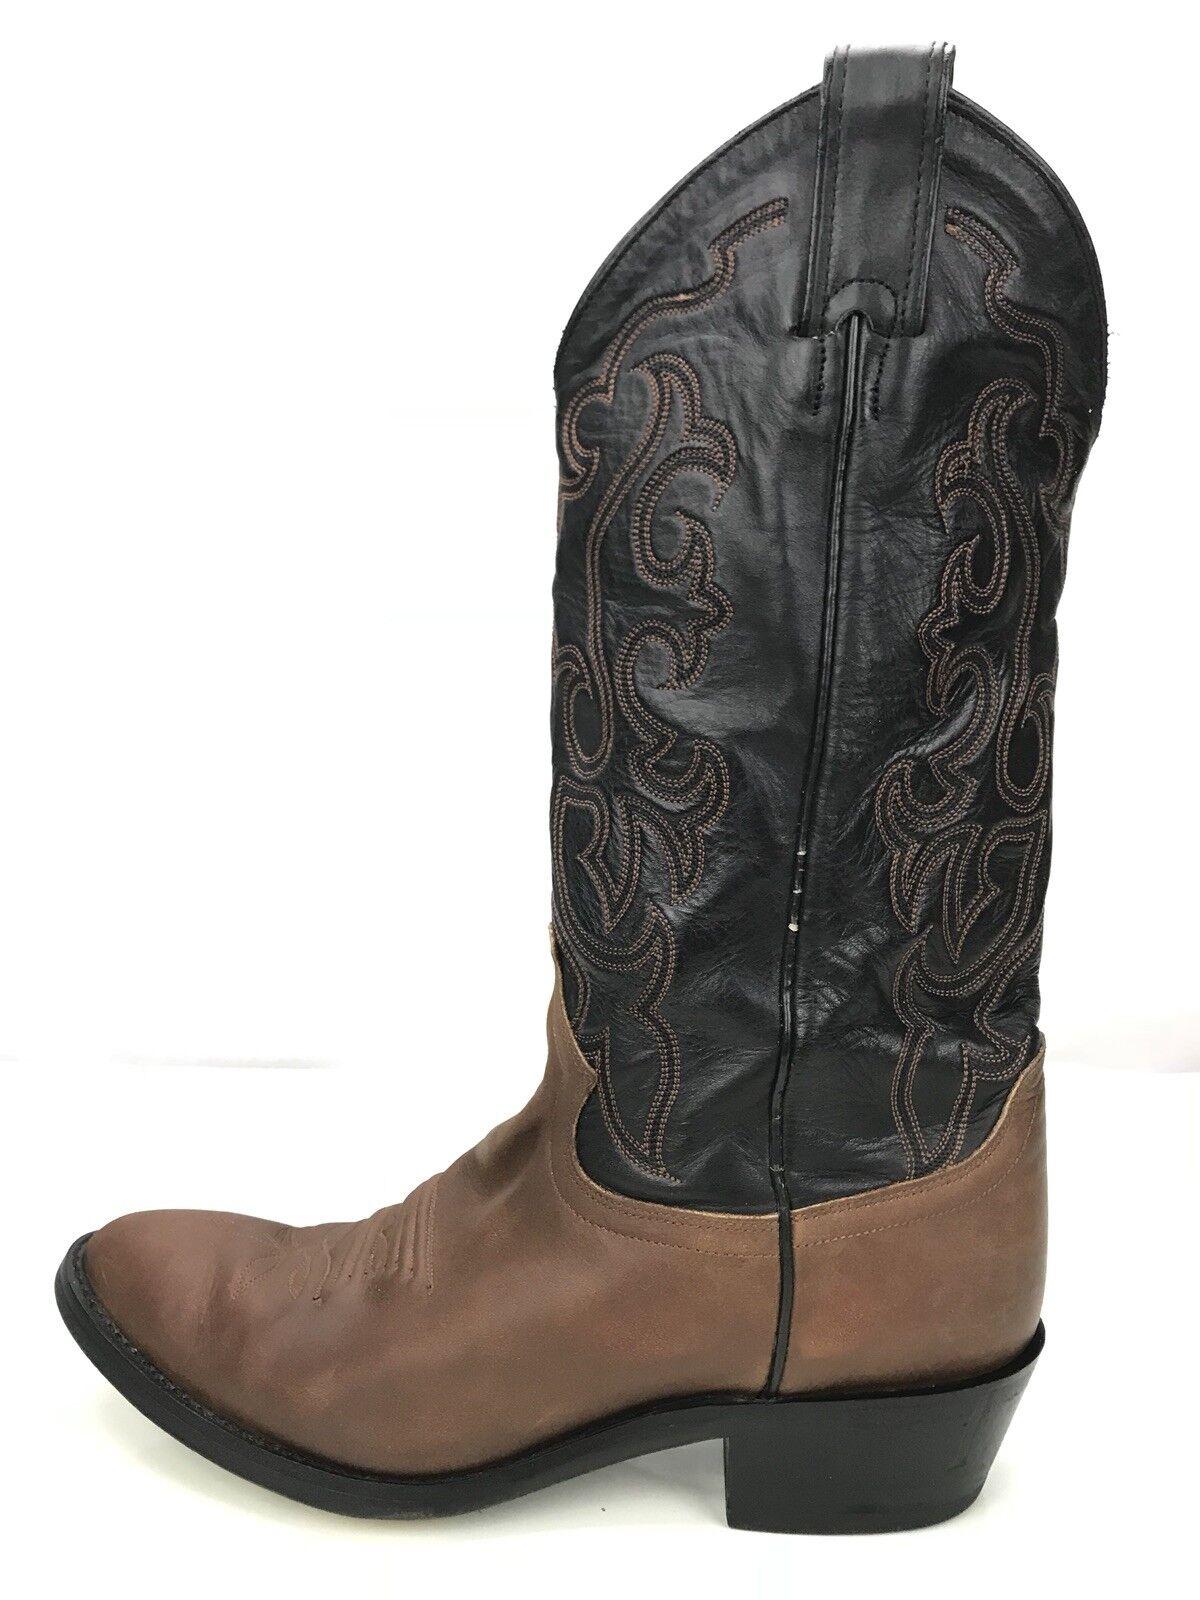 Justin Stivali Brown Coffee Pelle Cowboy Western Stivali 2428 Uomo Size 8.5D